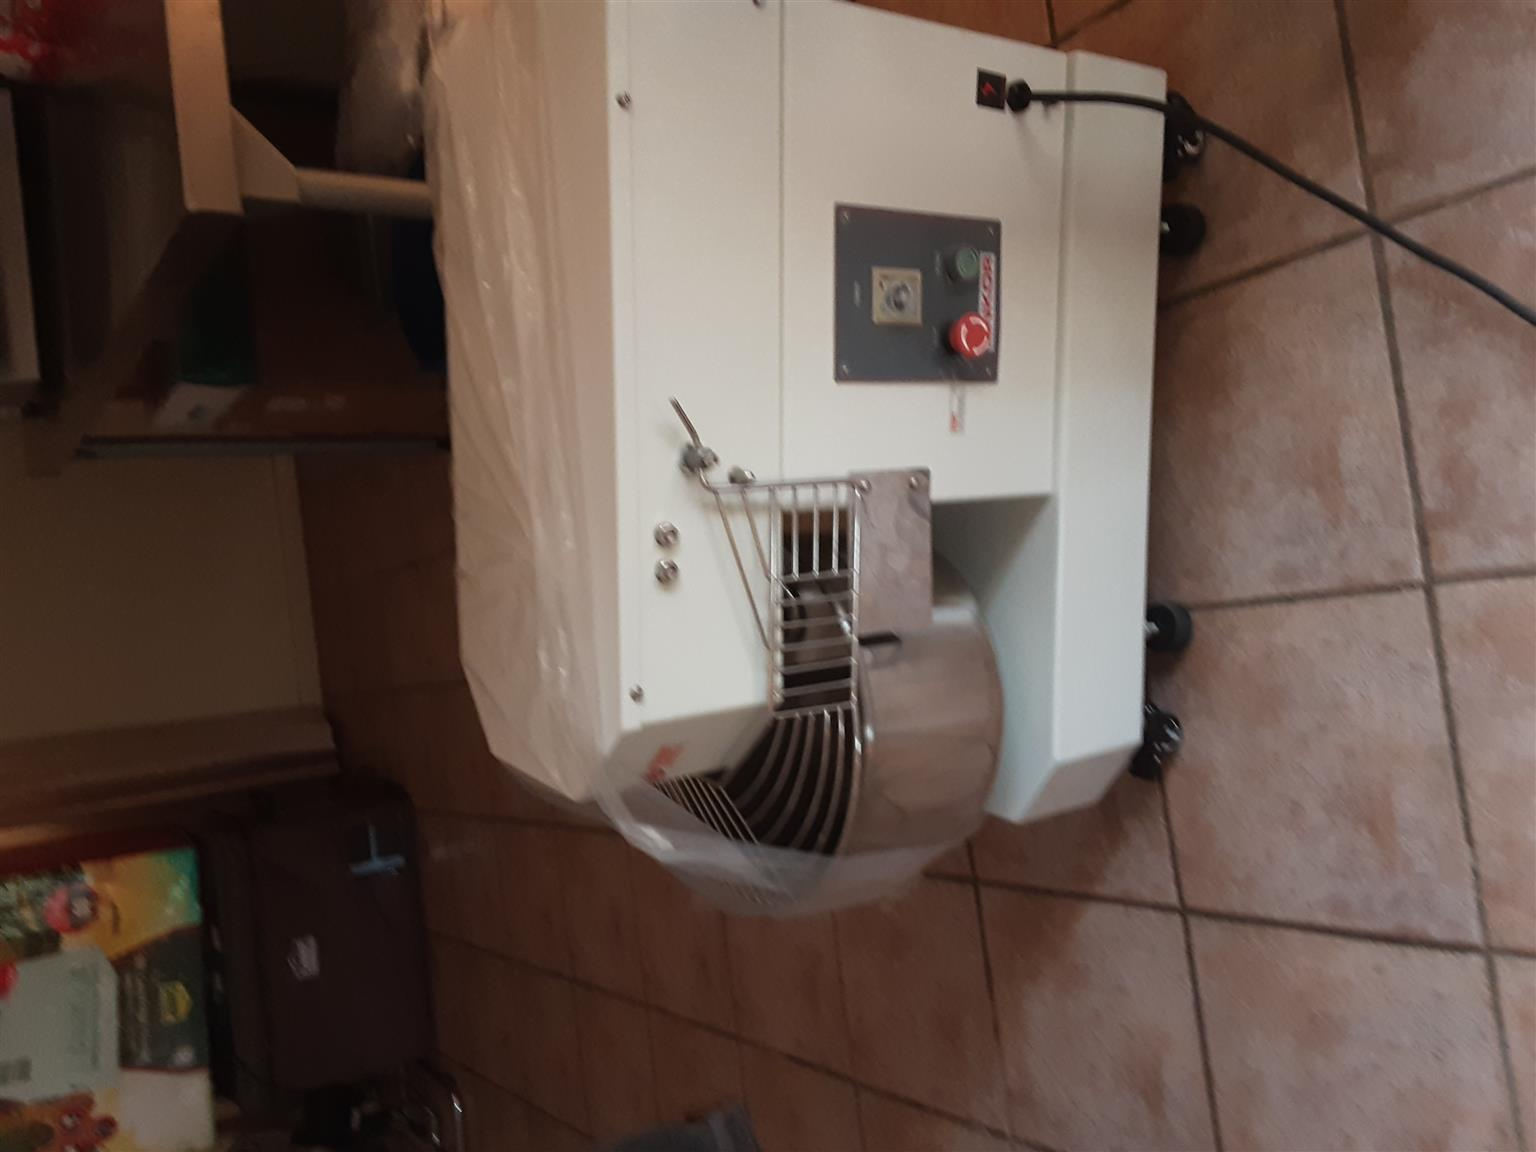 Ankor 20 liter dough mixer